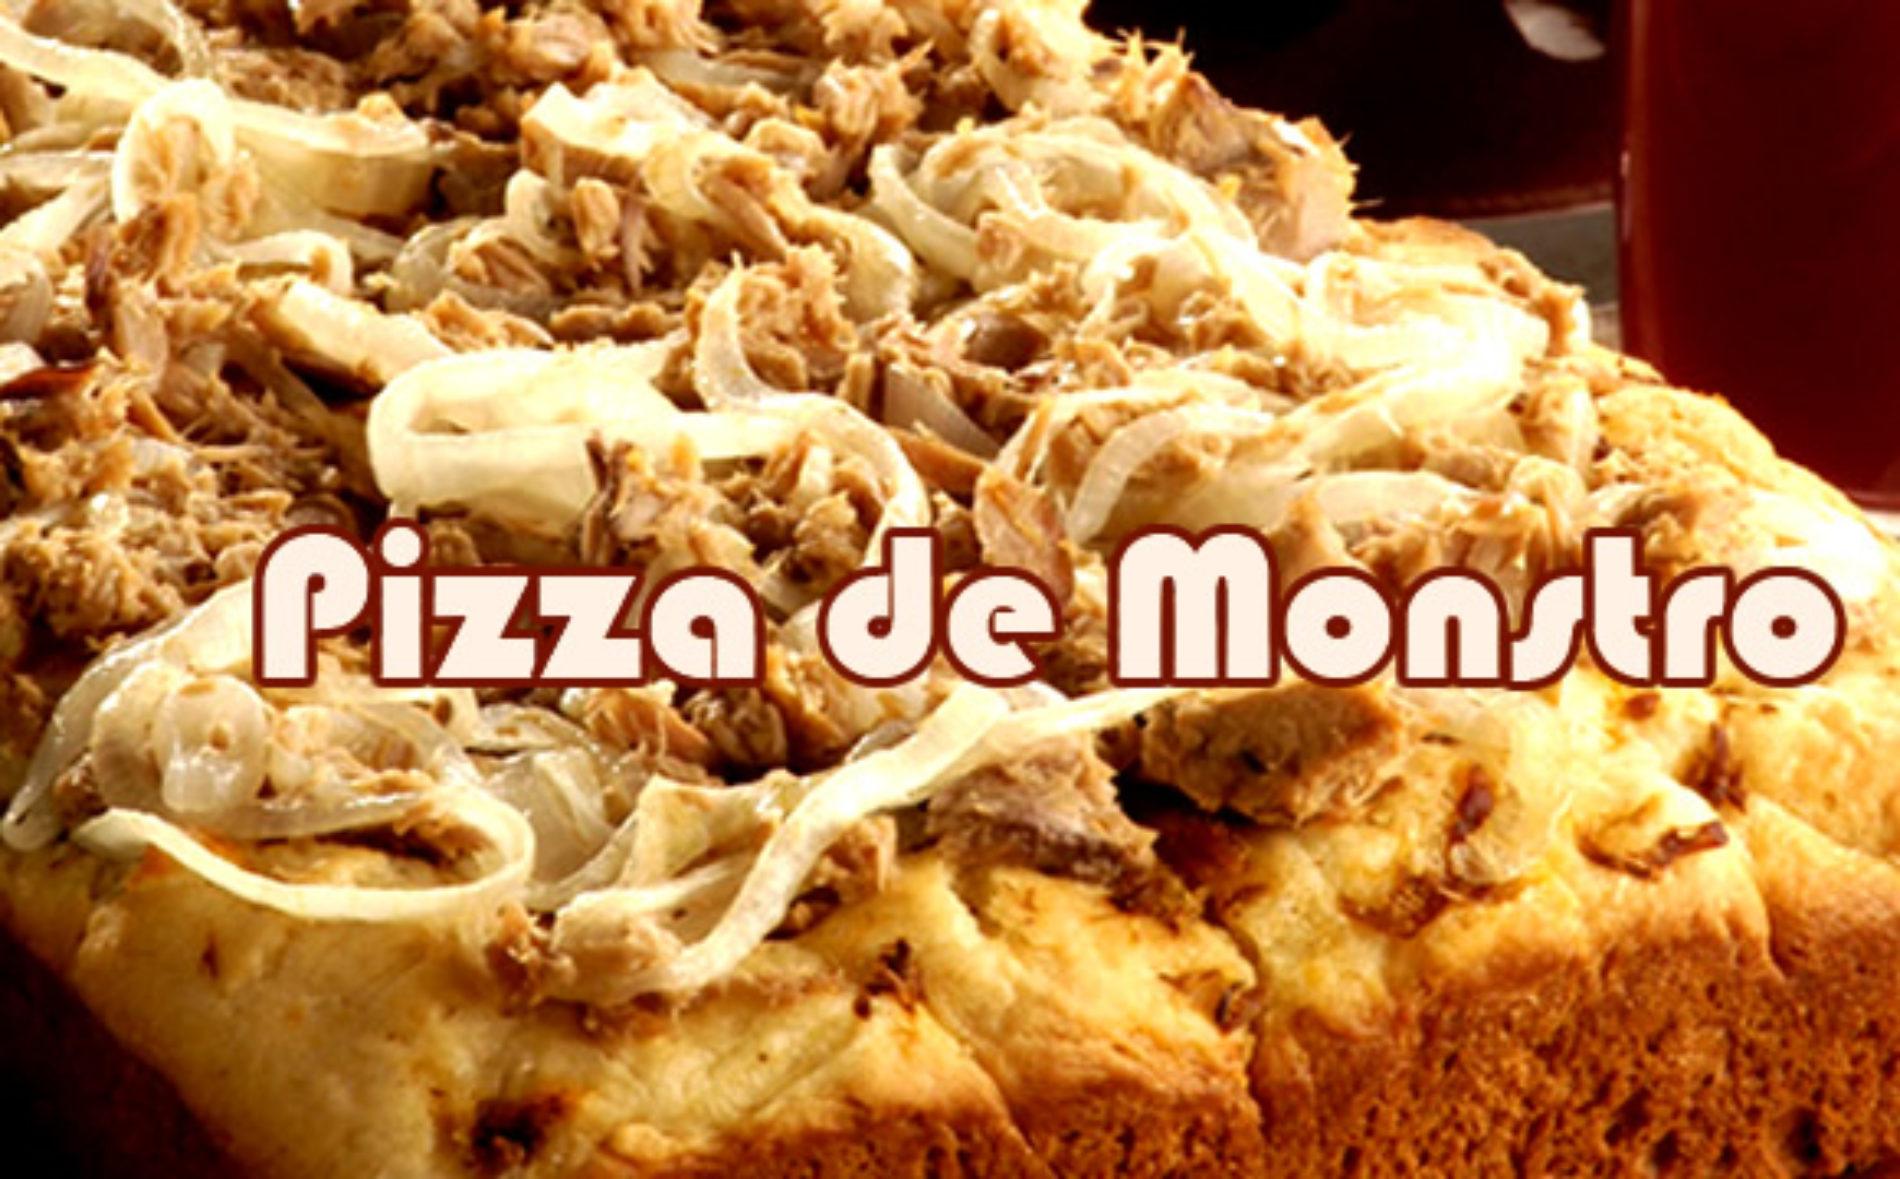 Pizza de Monstro